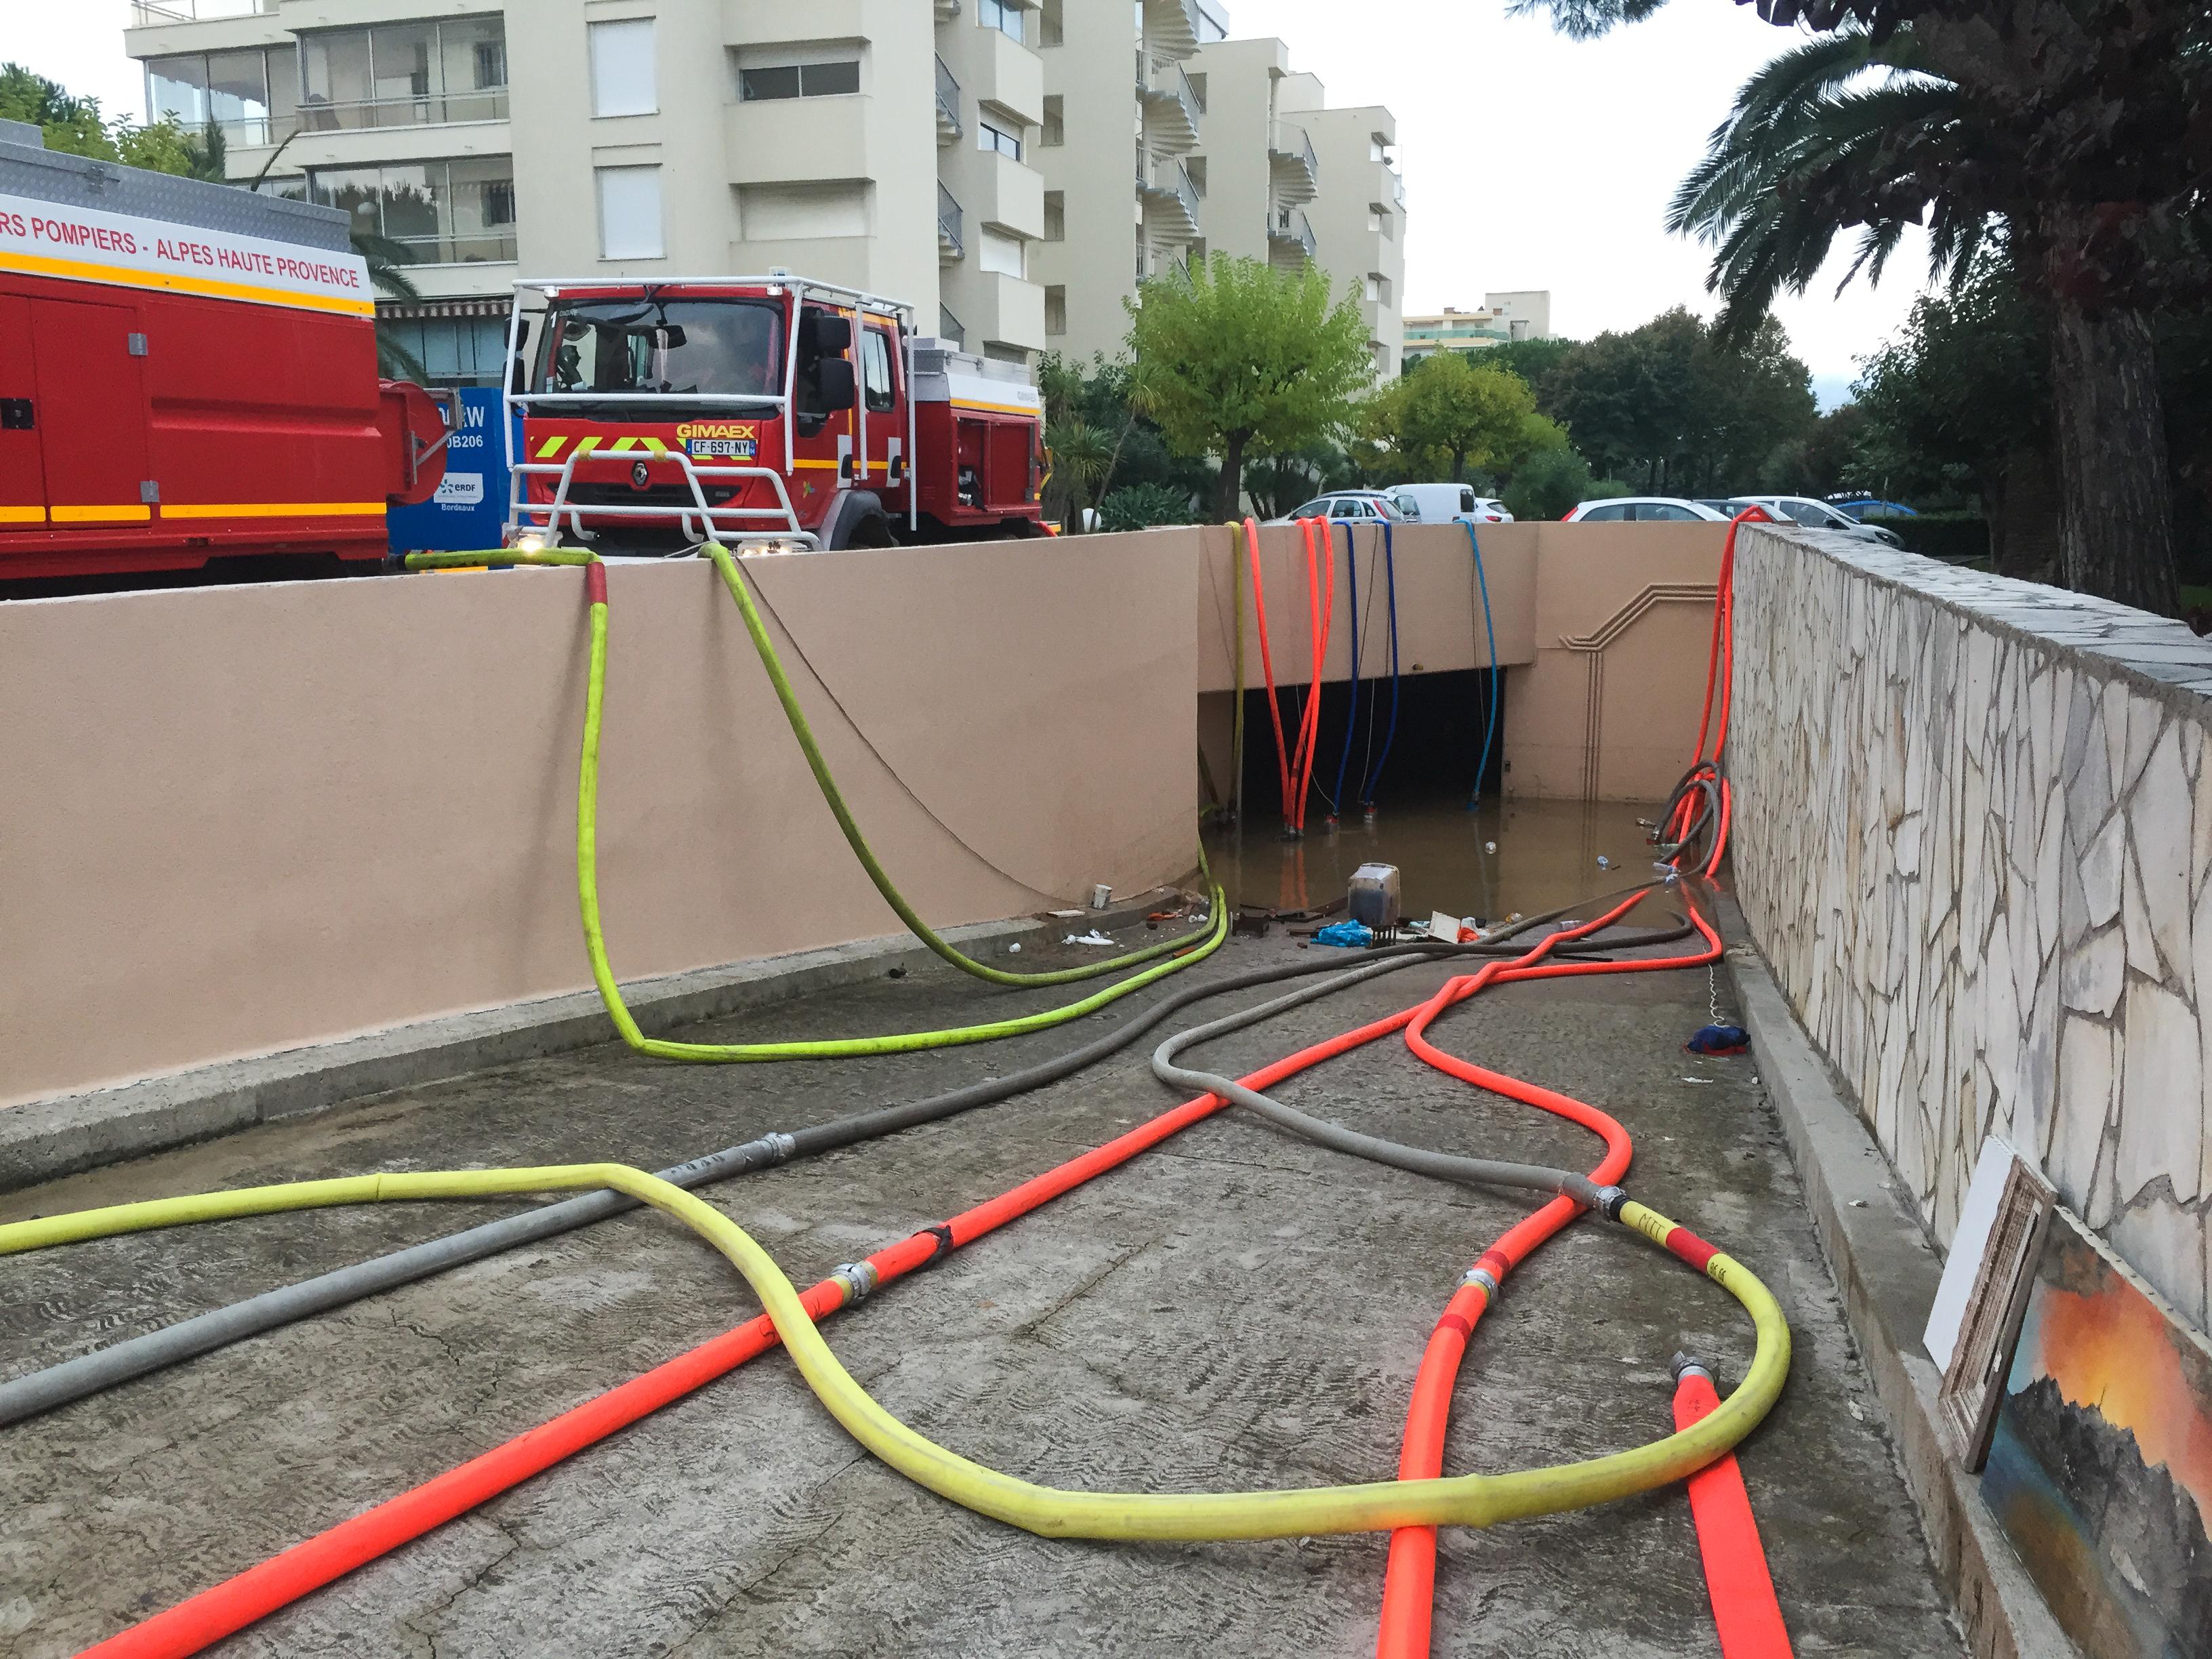 Derni res interventions marquantes du sdis 04 for Cannes piscine municipale